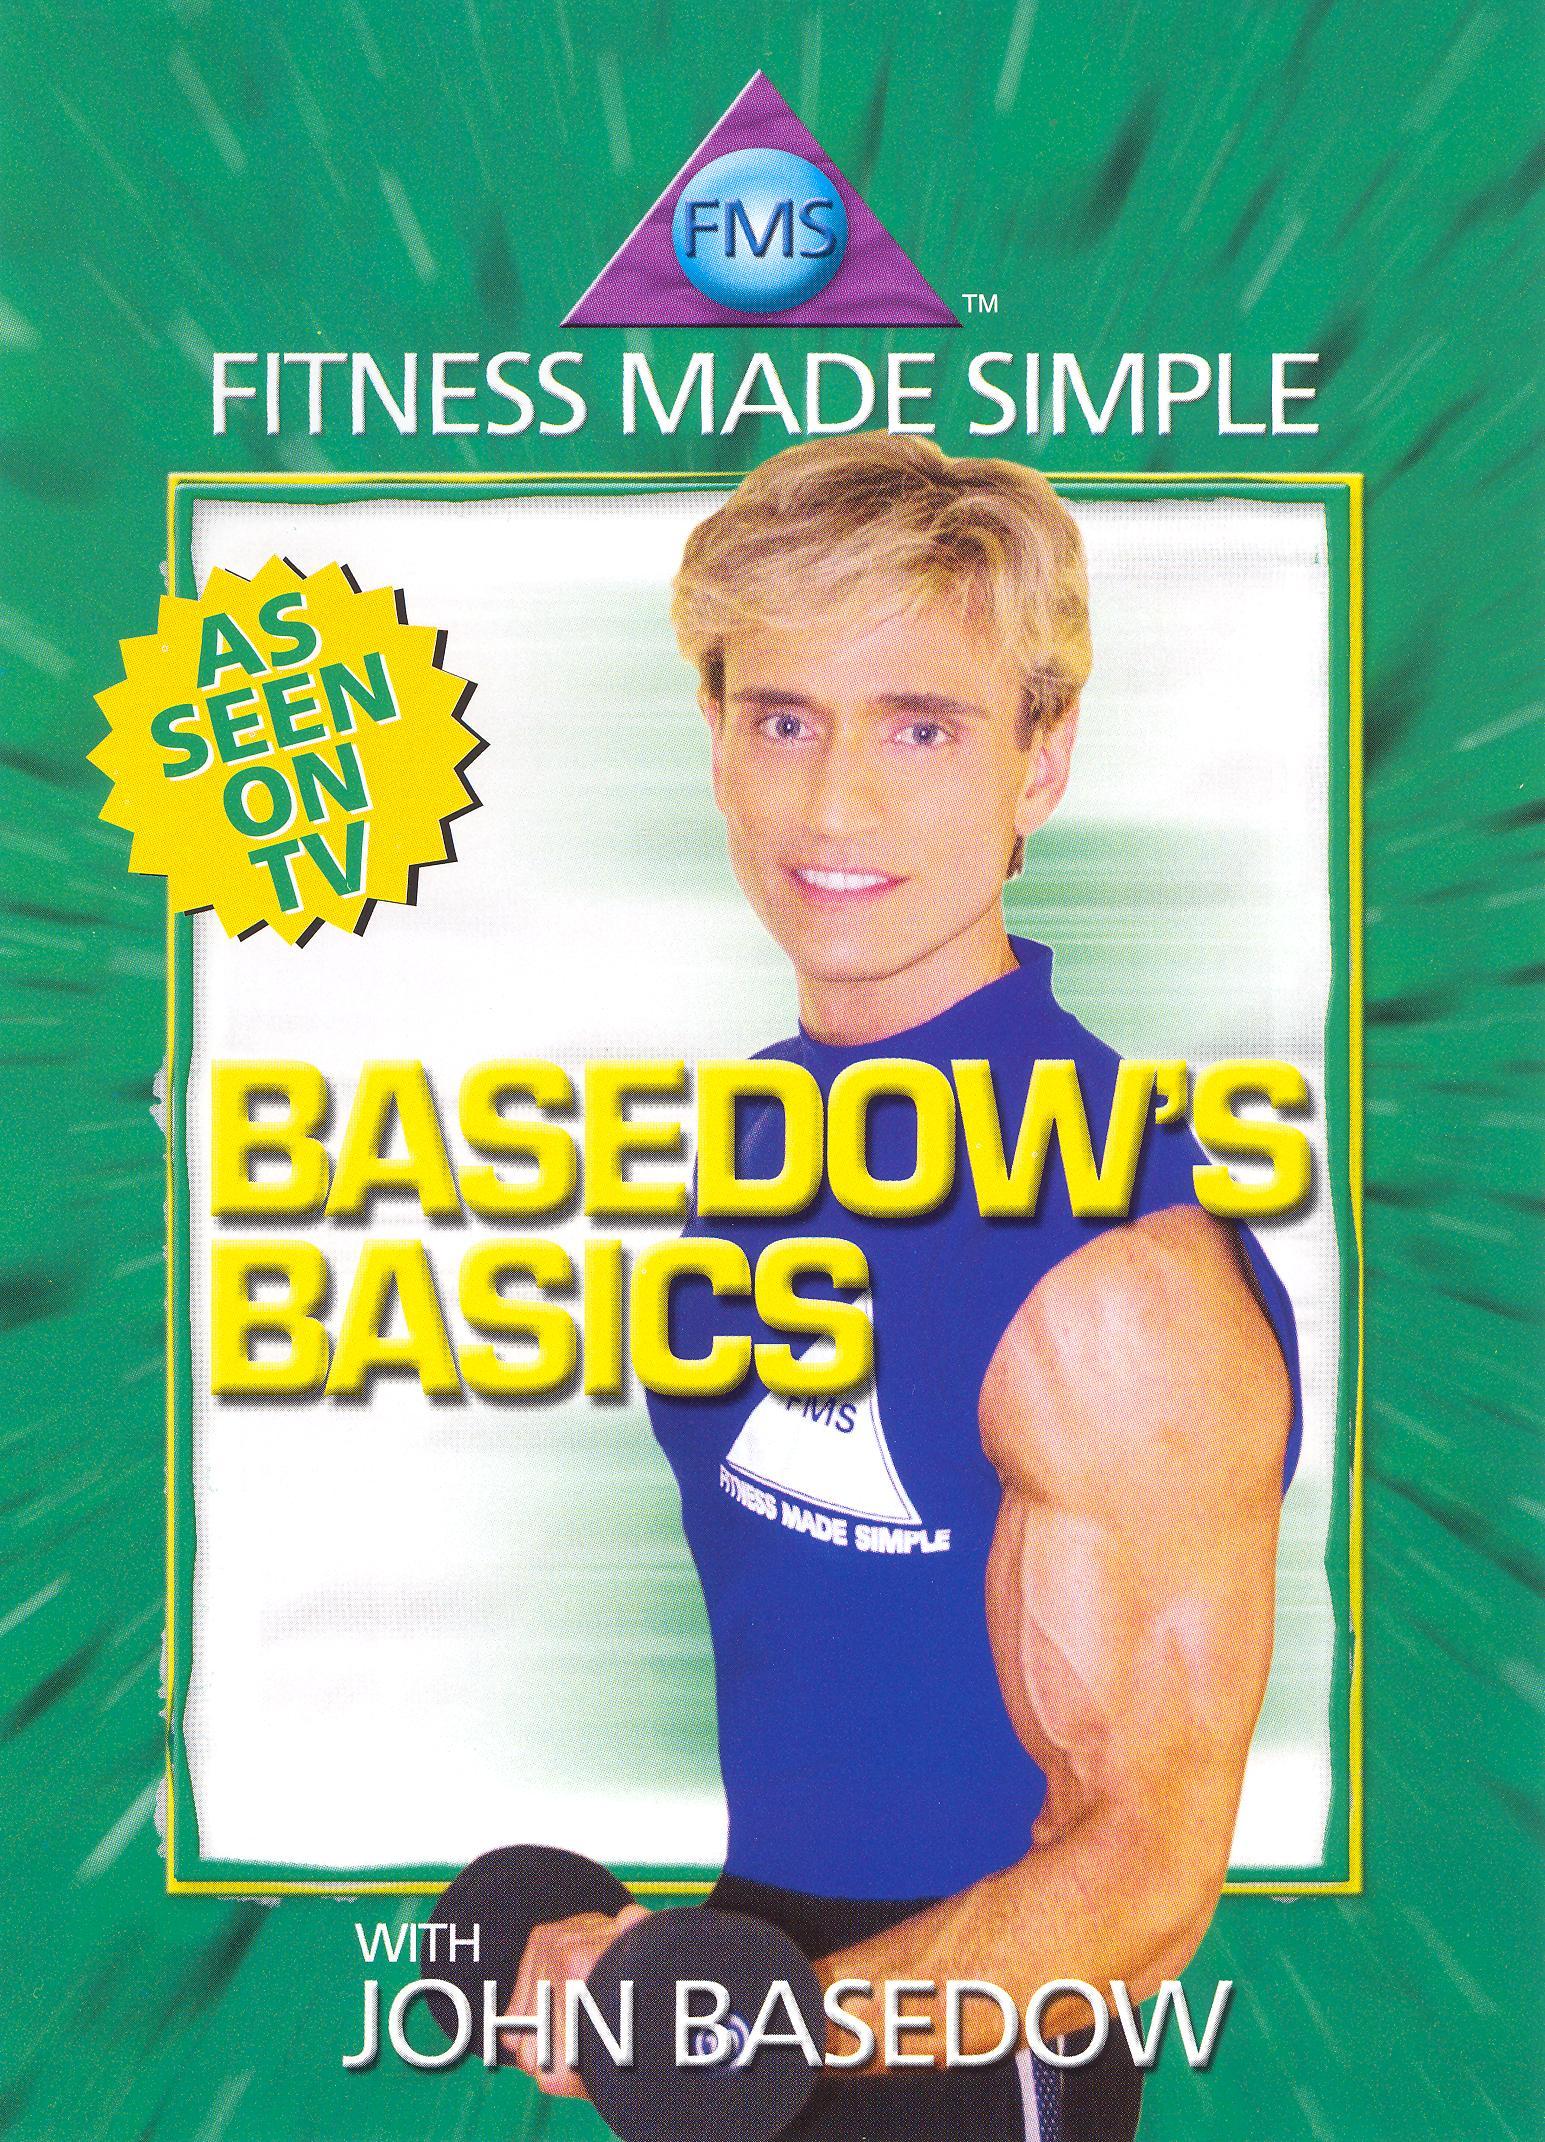 John Basedow: Fitness Made Simple - Basedow's Basics